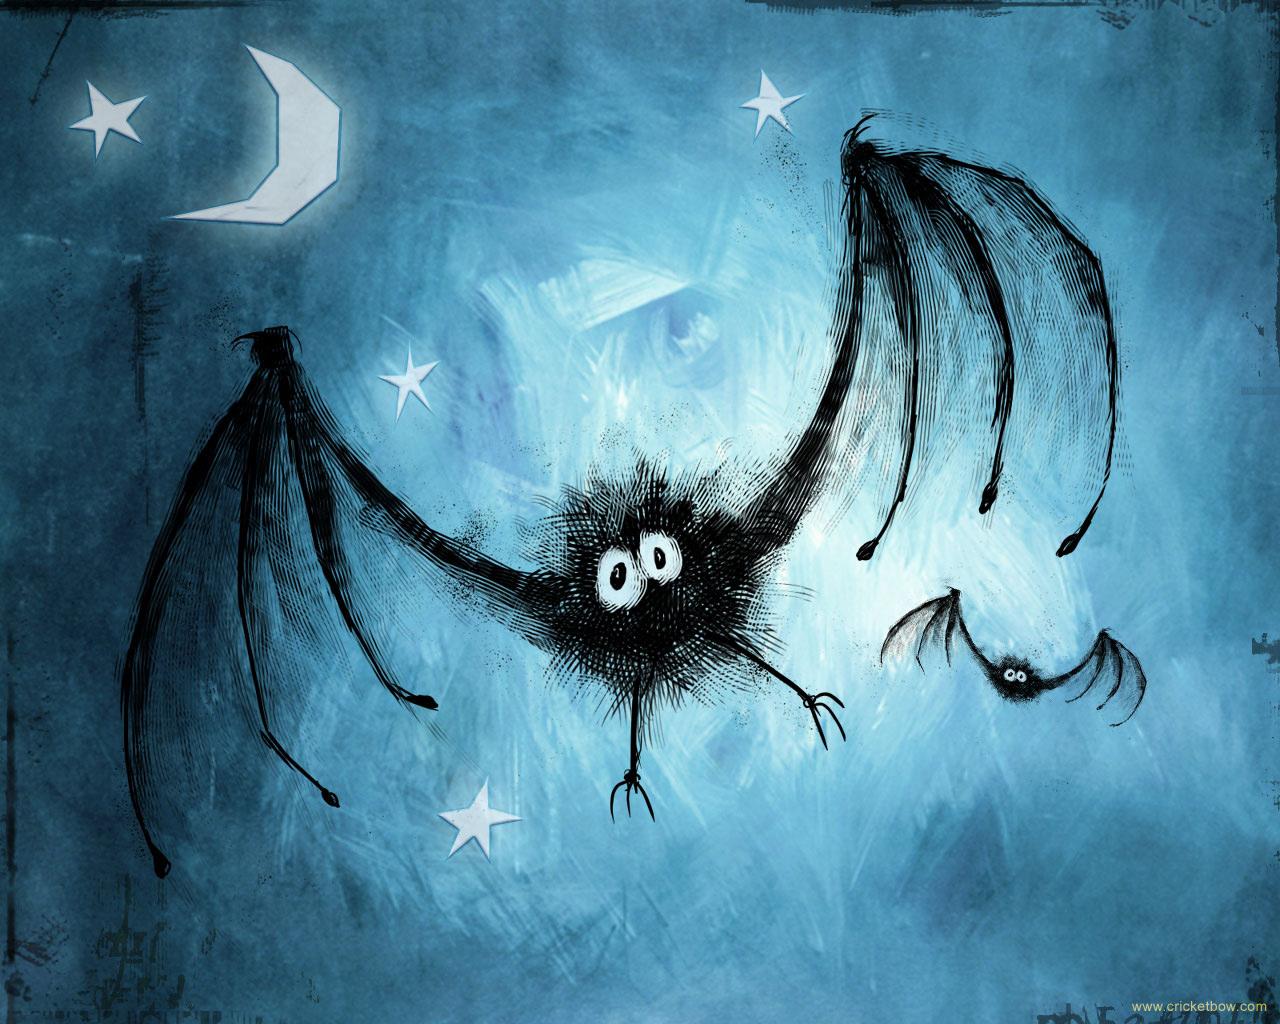 Spoooooky bat... actually no, he's really kinda cute isn't he? Let's call him Ferdinand!